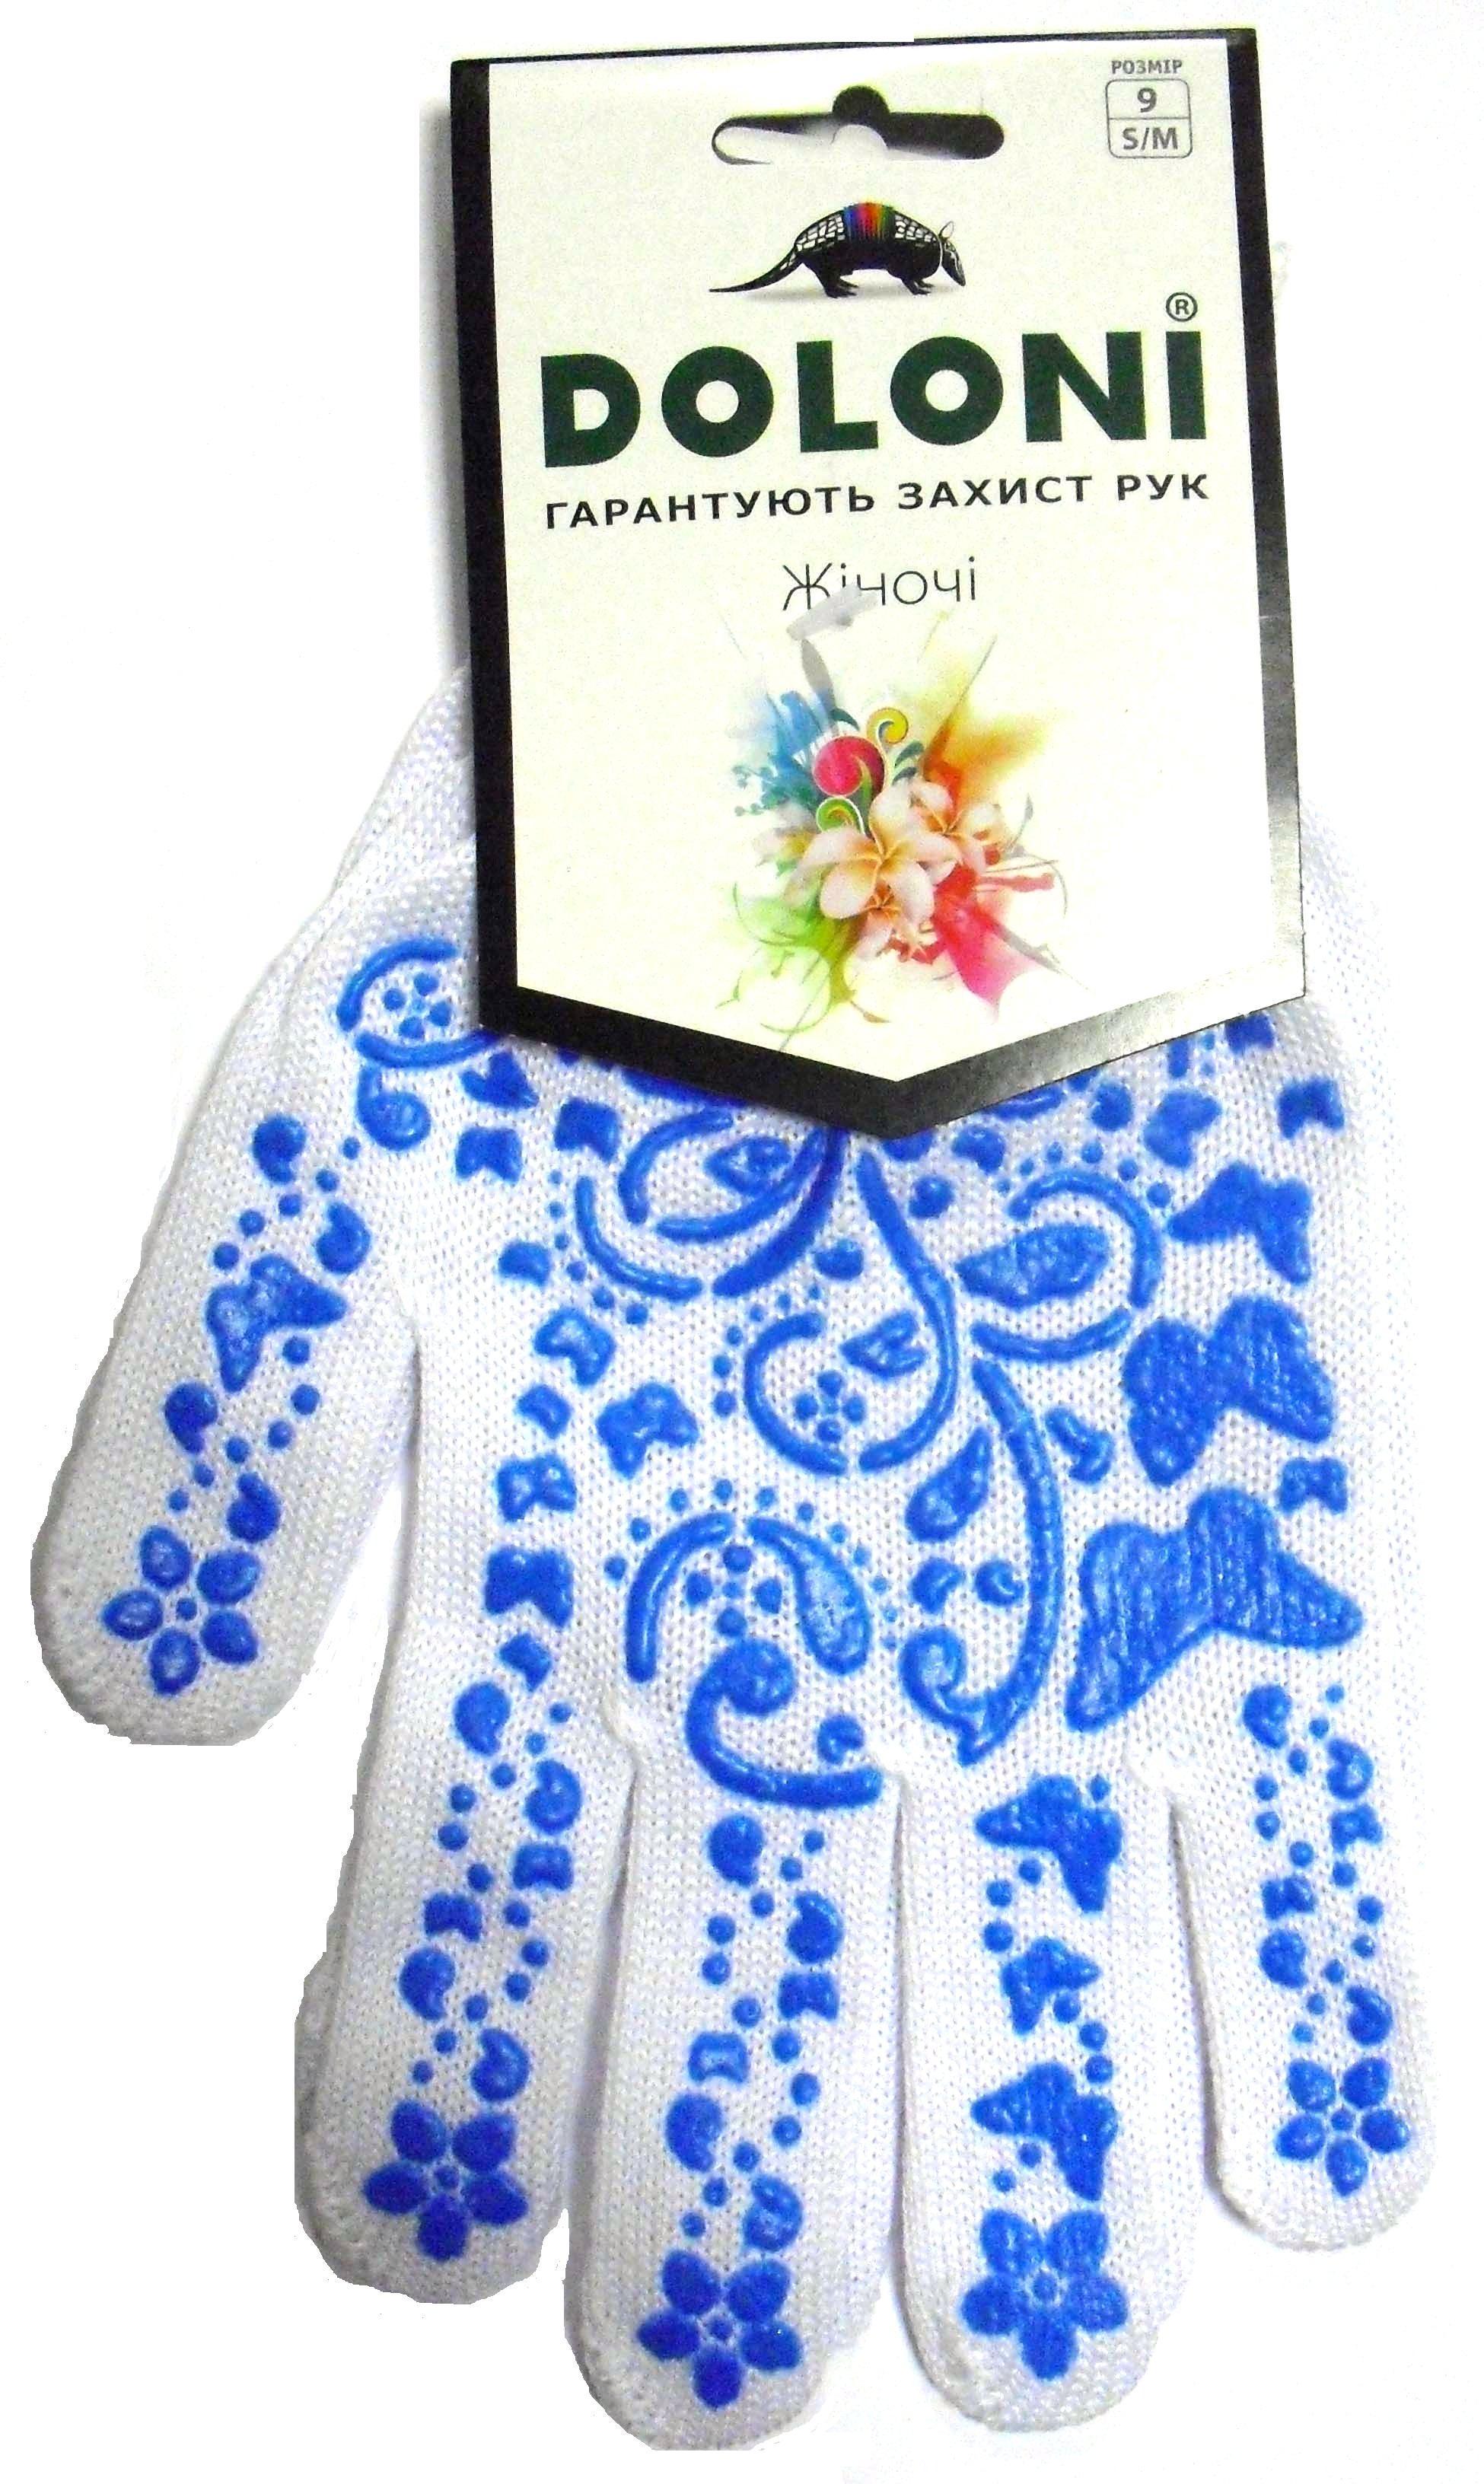 Перчатки ПВХ Doloni 711  белая с голубым рисунком ПВХ (бабочка) бабочка белая с рисунком garcon ут 00004860